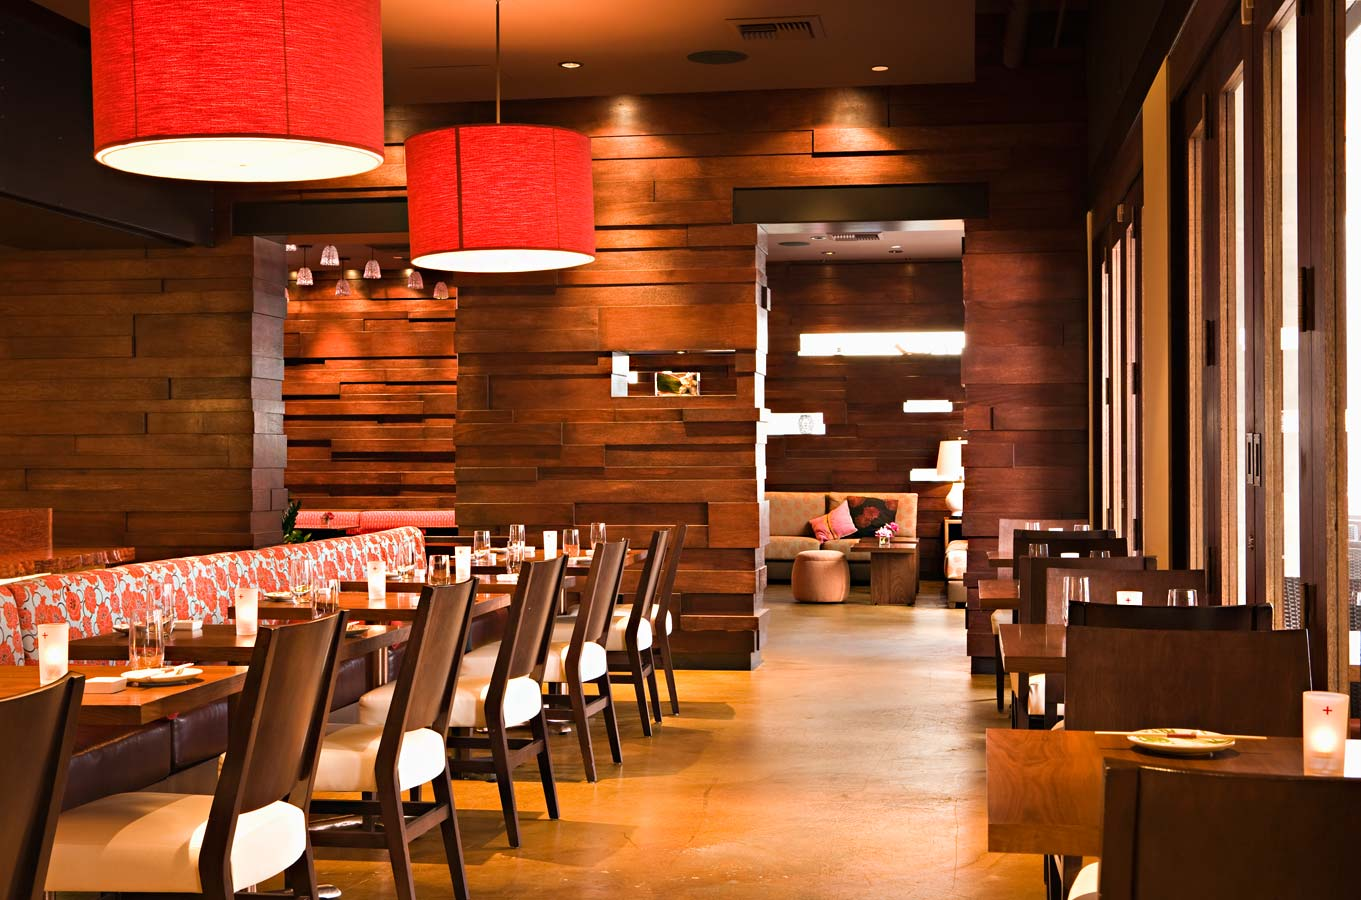 Mix and chic cool designer alert chris barrett - Interior designers for restaurants ...